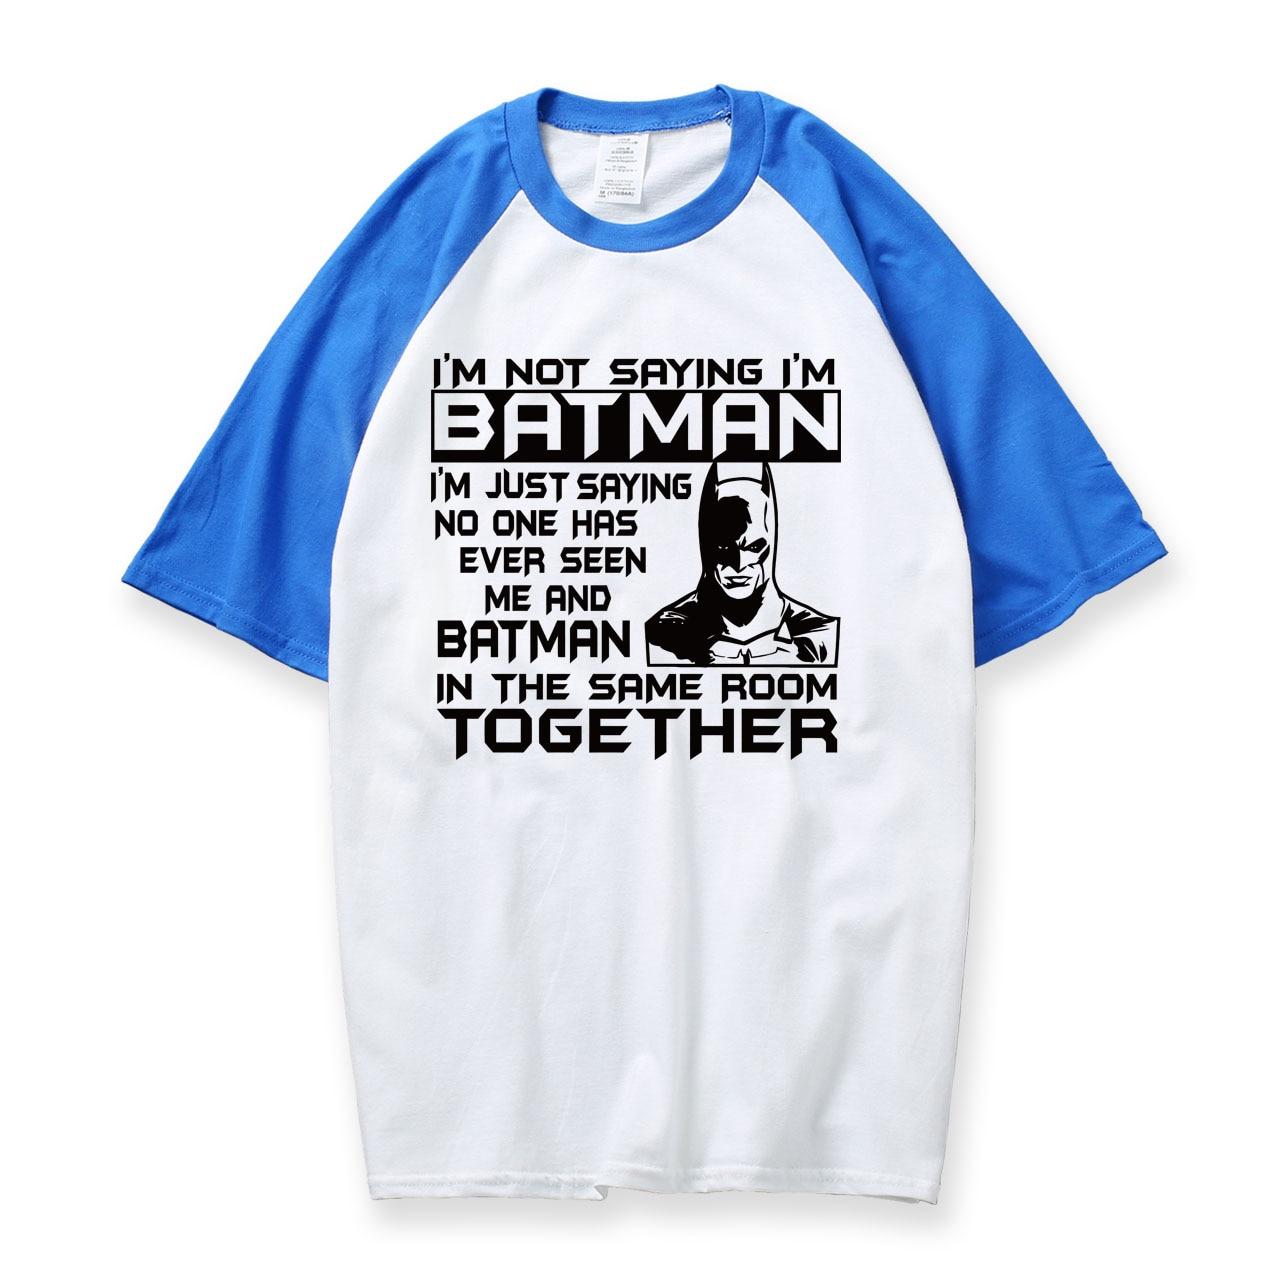 Raglan Tshirt Mens Large Black Adult I'm Not Saying I''m Batman Funny T-Shirt 2018 Hot Sale Summer Round Neck T Shirt For Men